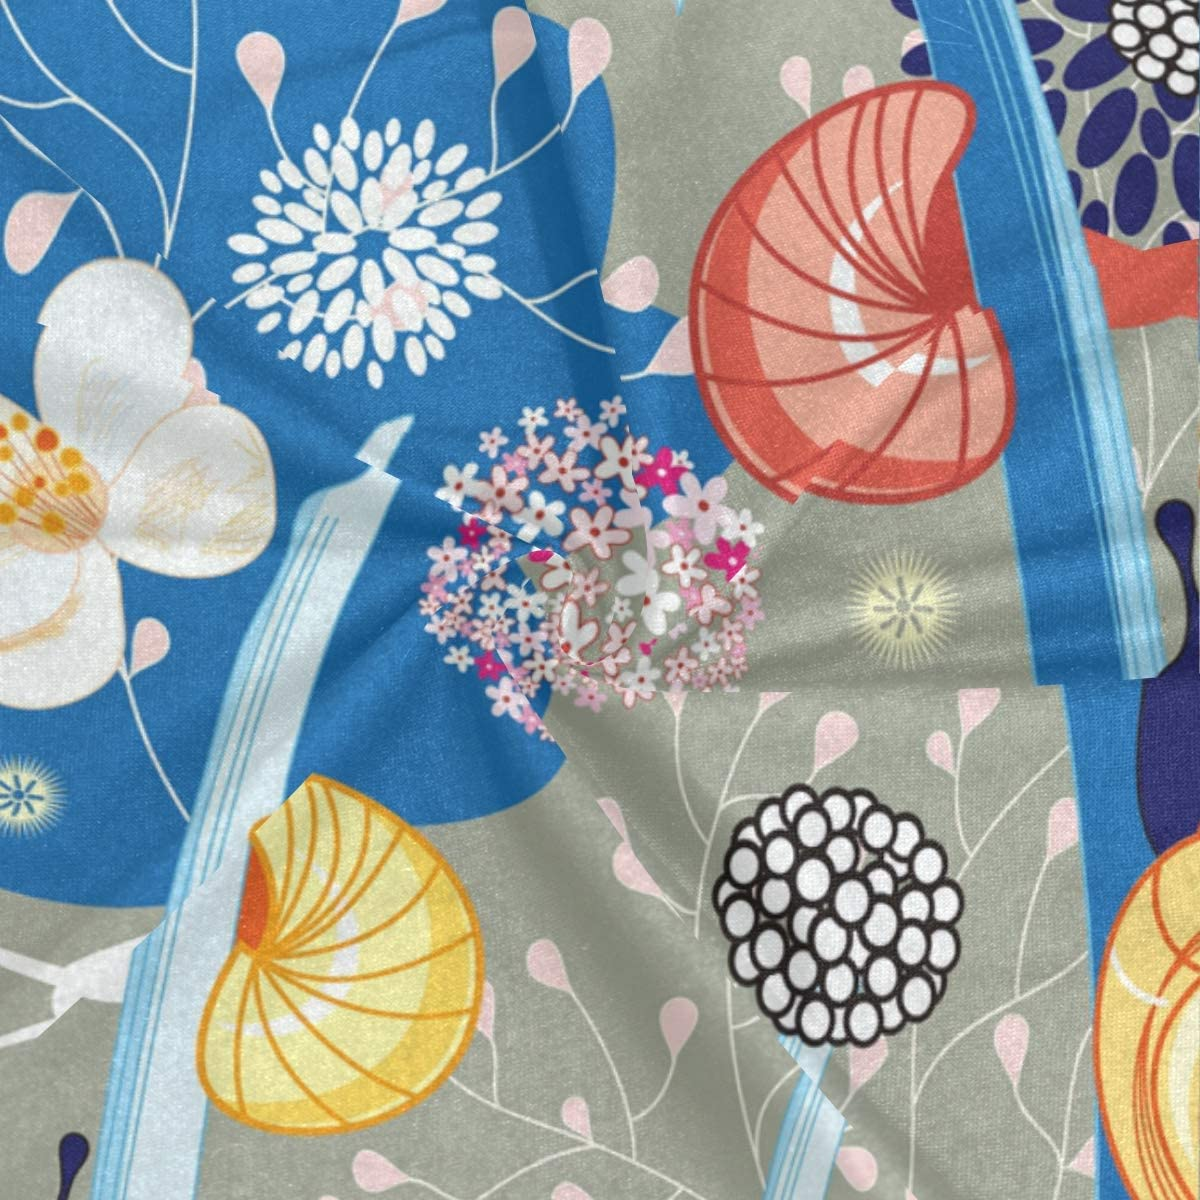 Bandana de flores coloridas con caracol con filtro para la cara PINLLG lavable accesorio para la cabeza para deportes de polvo cuello polaina multifuncional bufanda m/ágica